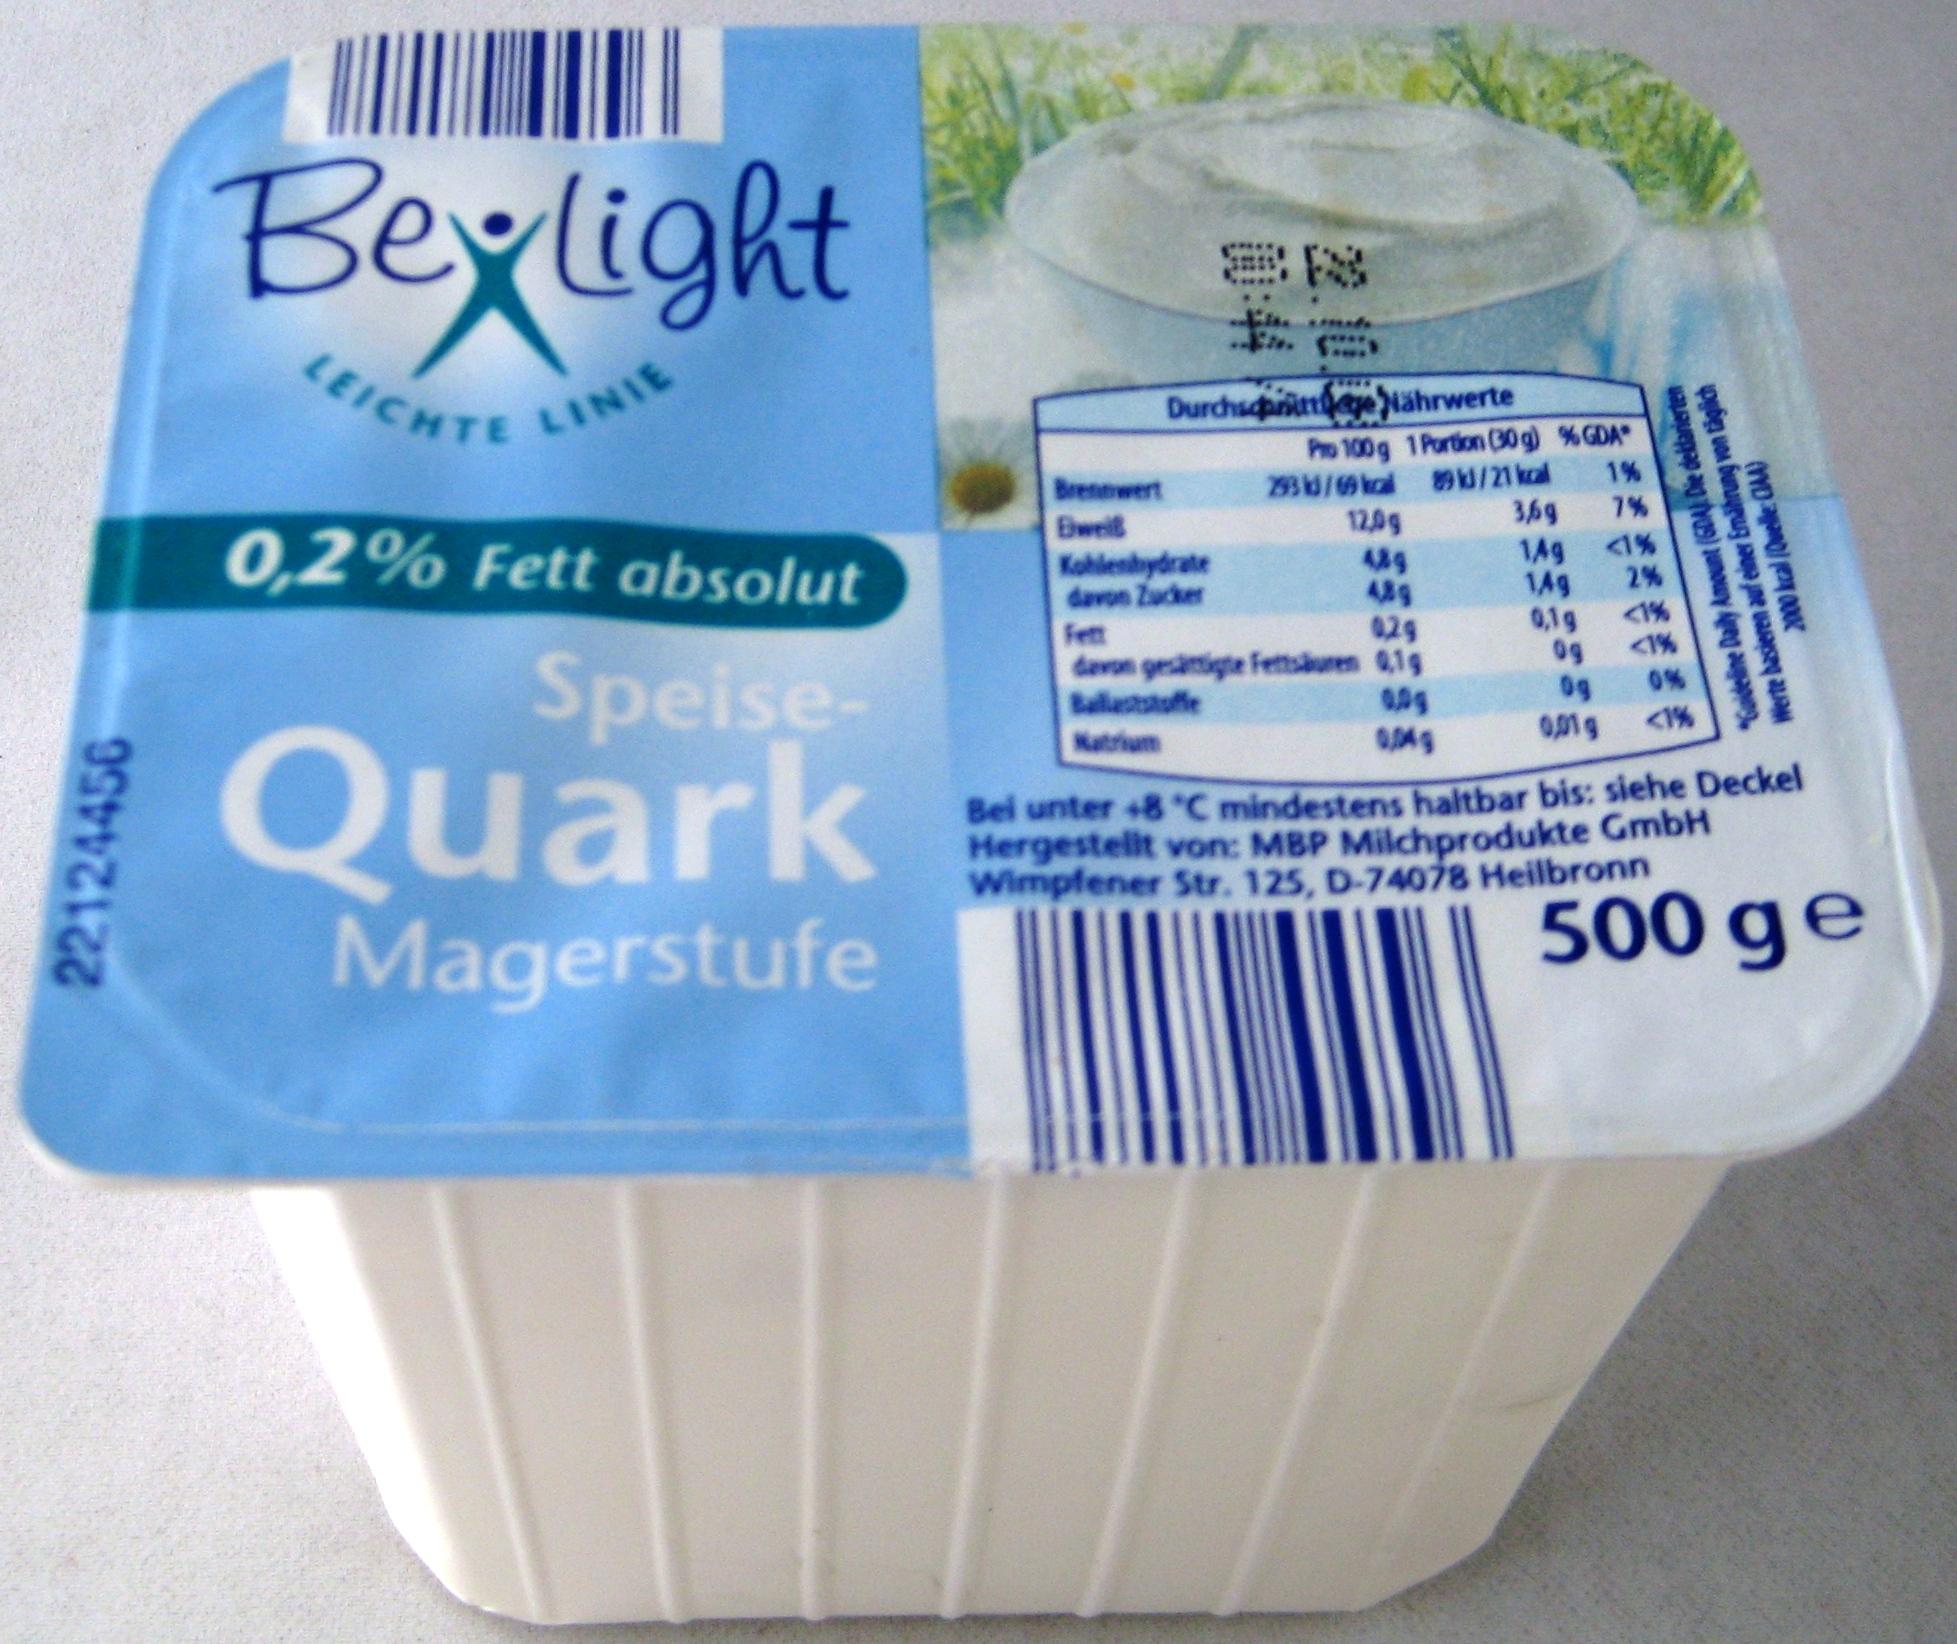 speisequark magerstufe 0 2 500 gramm arla foods deutschland gmbh niederlassung upahl k se. Black Bedroom Furniture Sets. Home Design Ideas